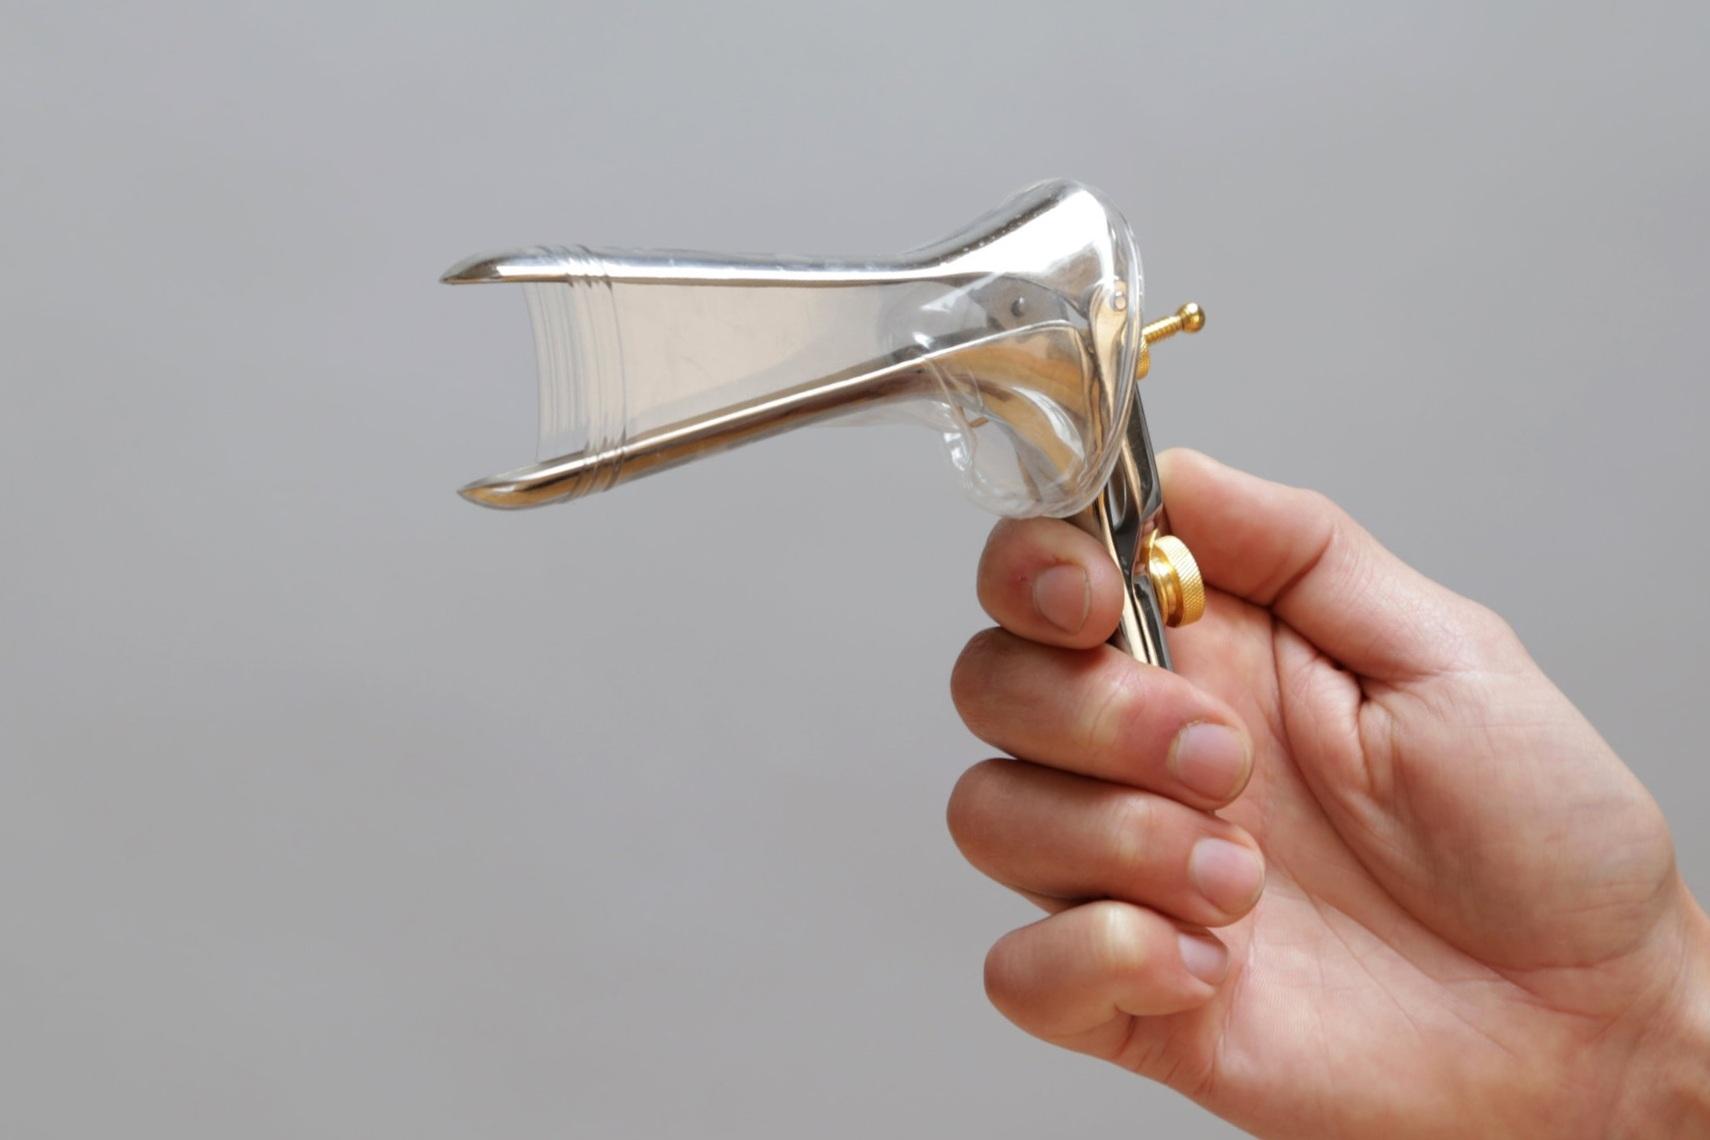 Allows a smaller, more comfortable speculum to retract more tissue.